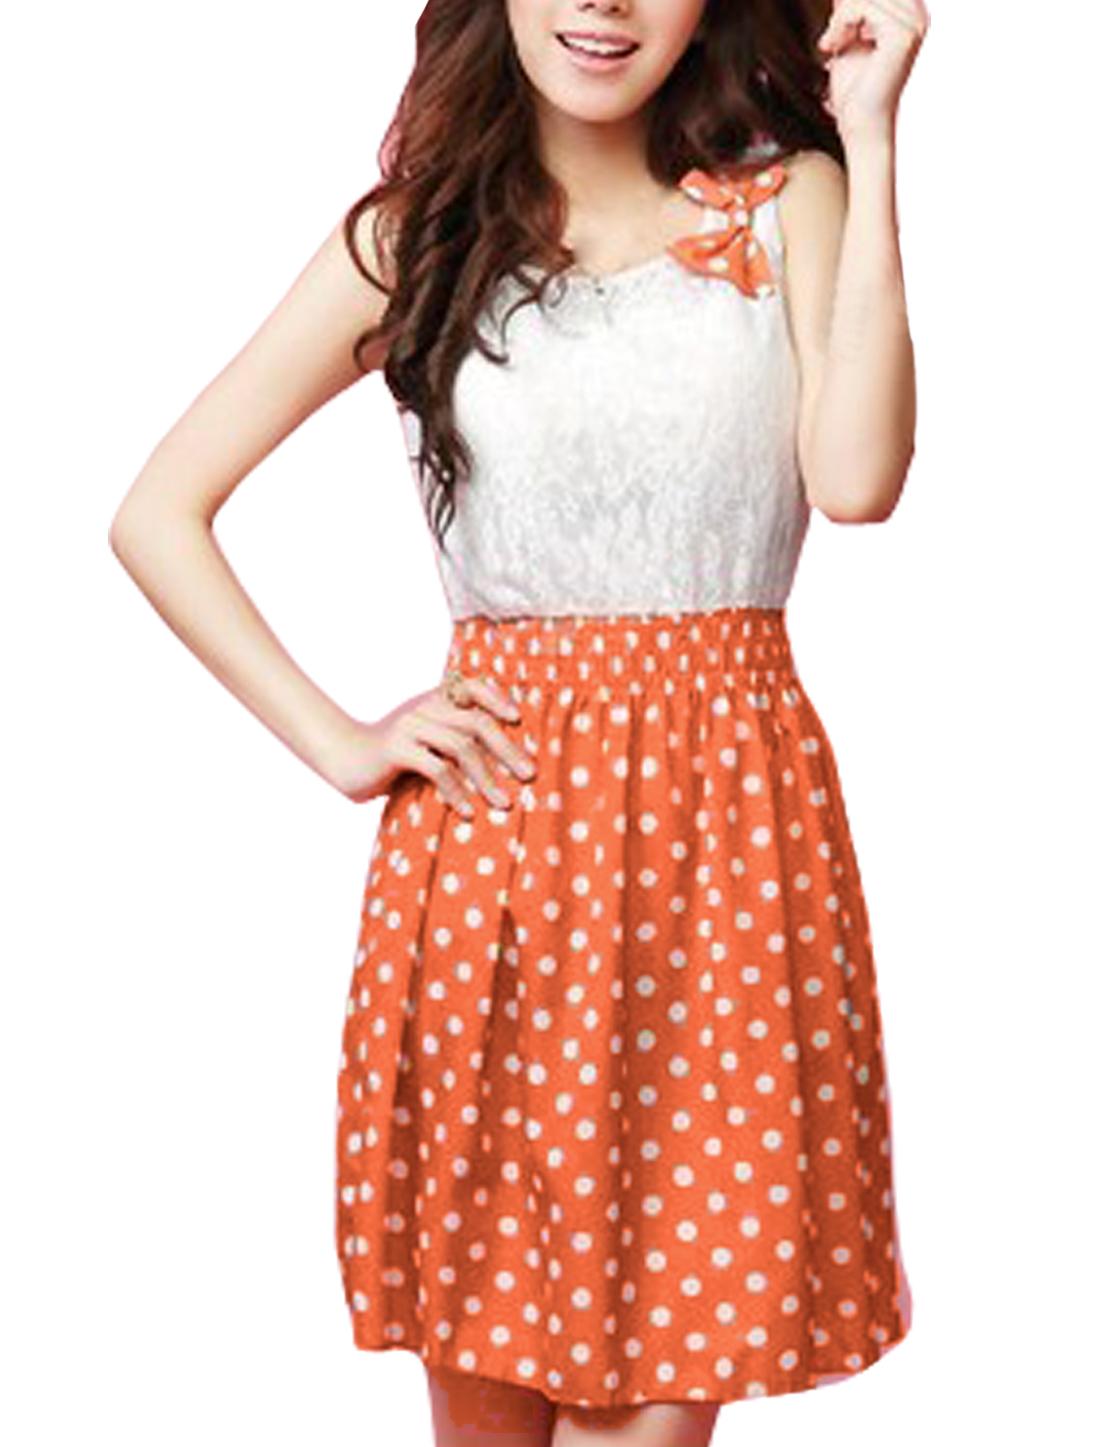 Women Sleeveless Dots Design Butterfly Knot Left Upper Dress Orange S